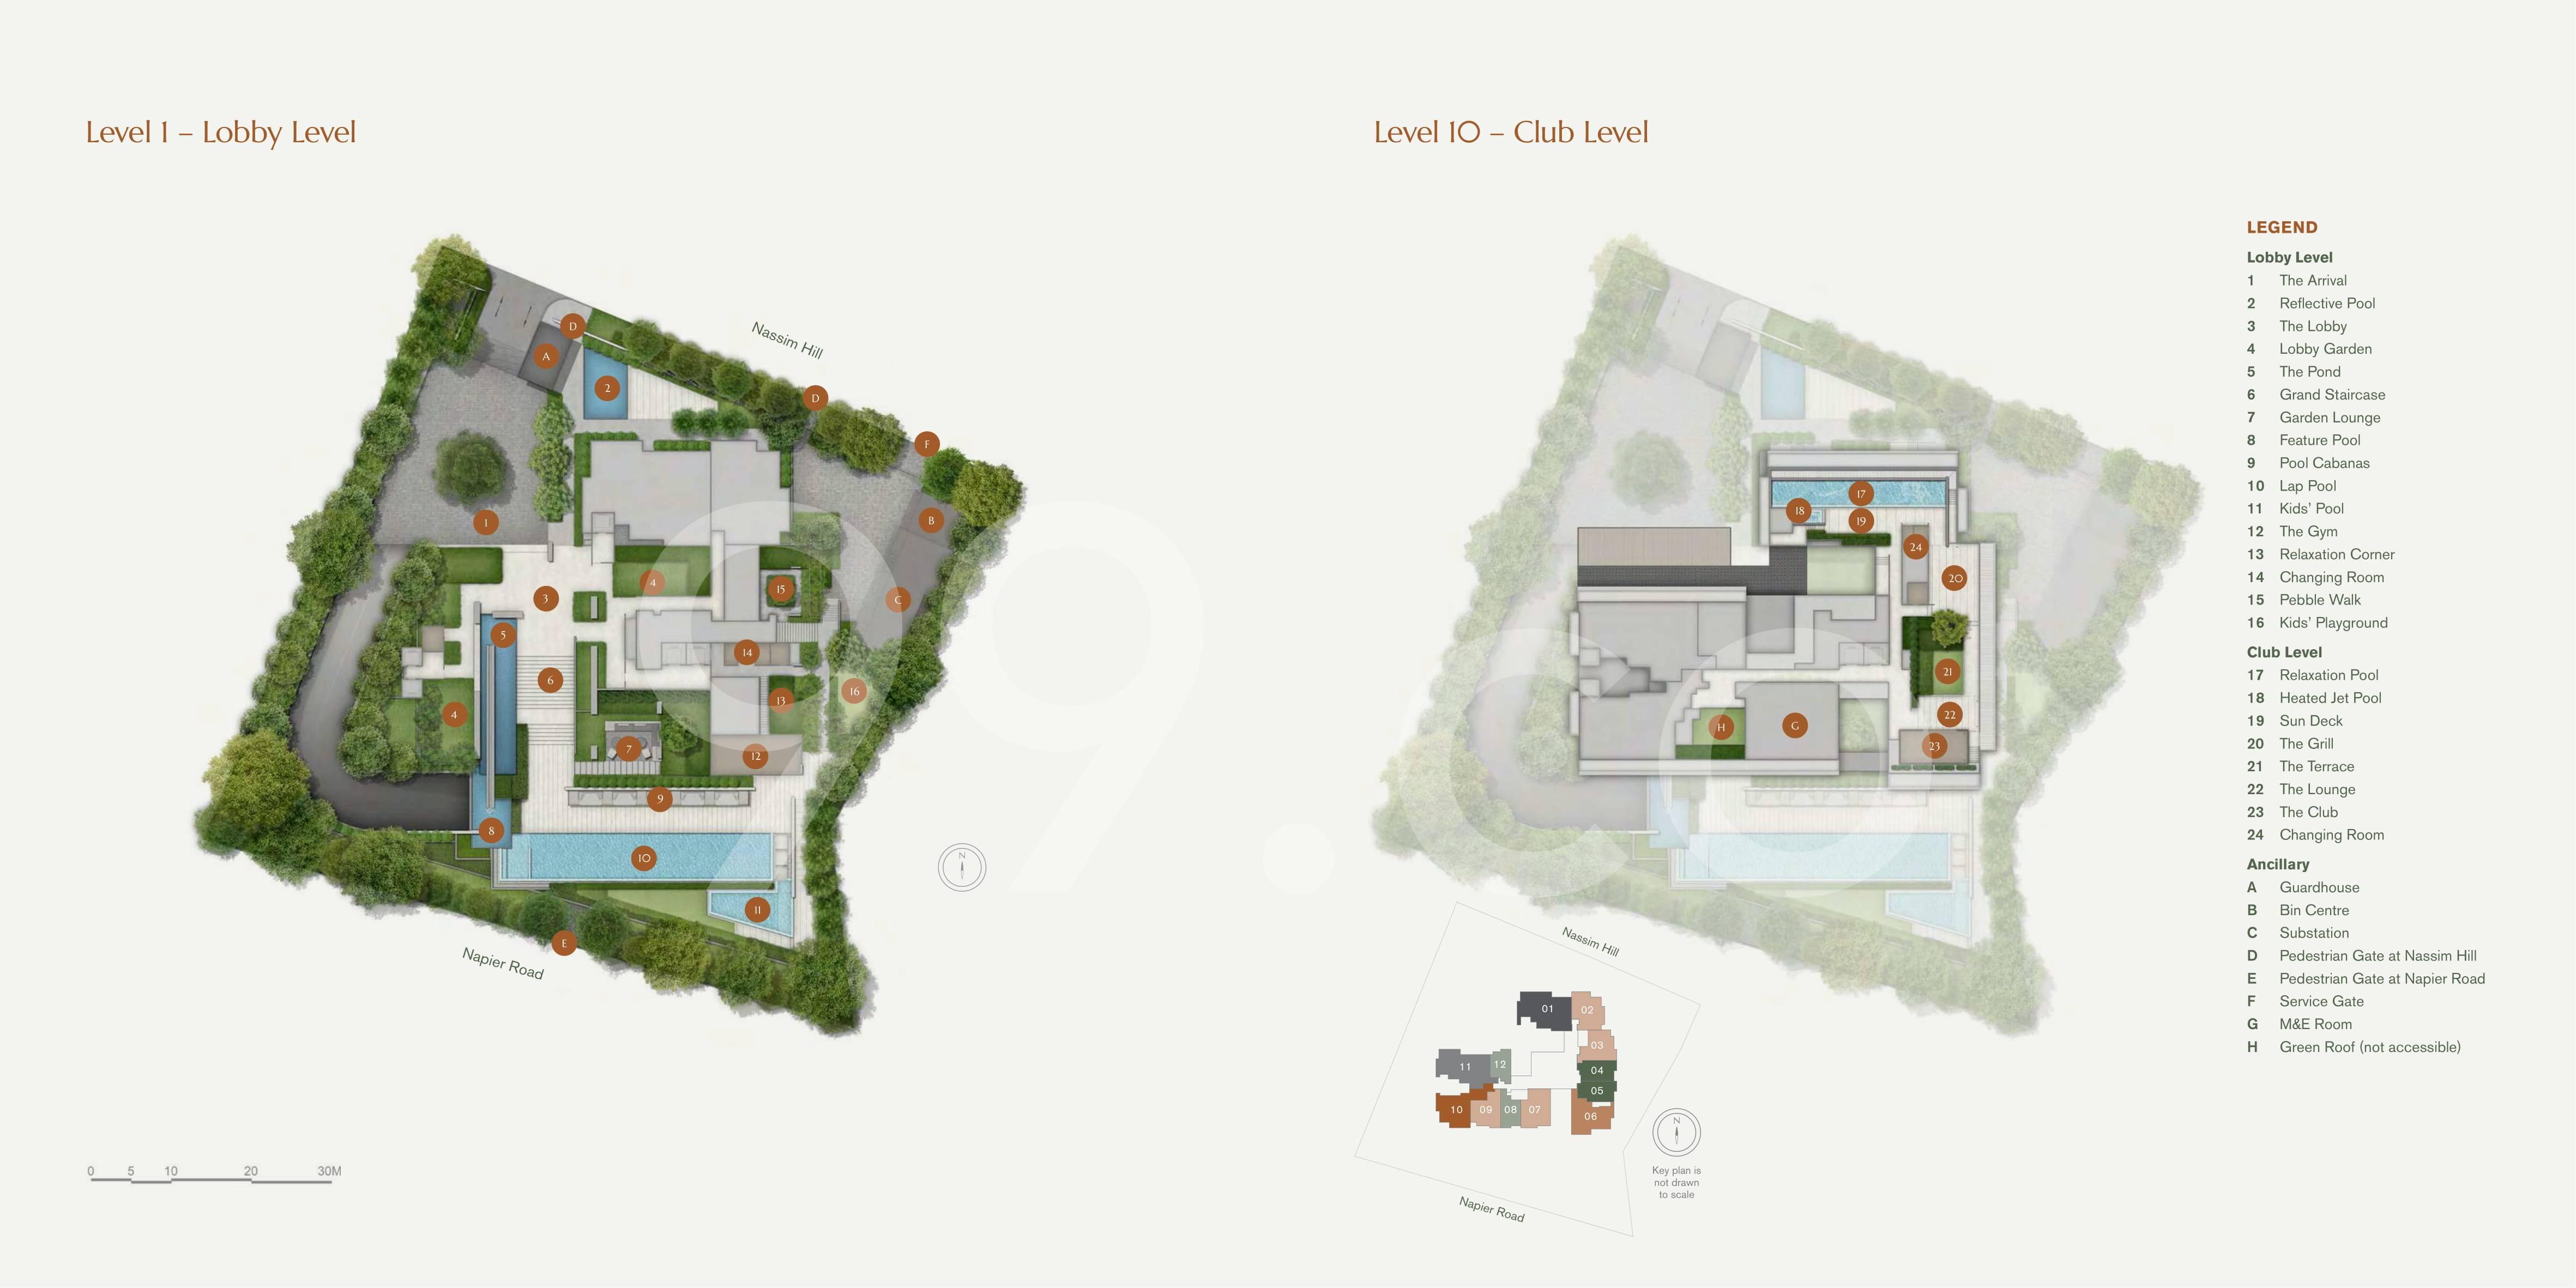 19 Nassim site plan